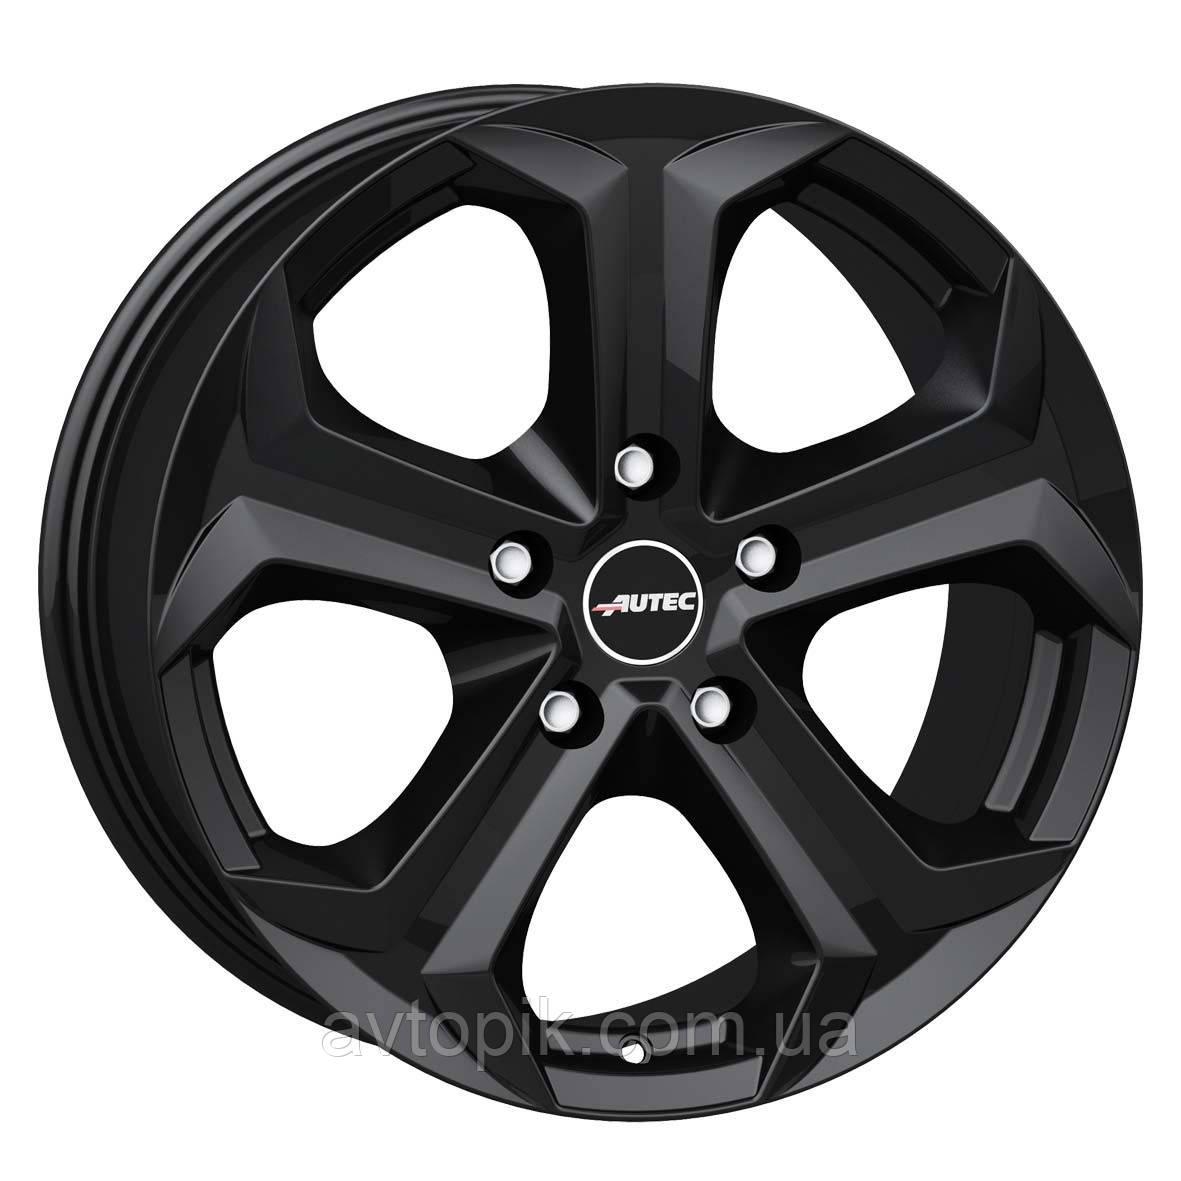 Литые диски Autec Xenos R17 W7 PCD5x114.3 ET49 DIA70.1 (matt black)